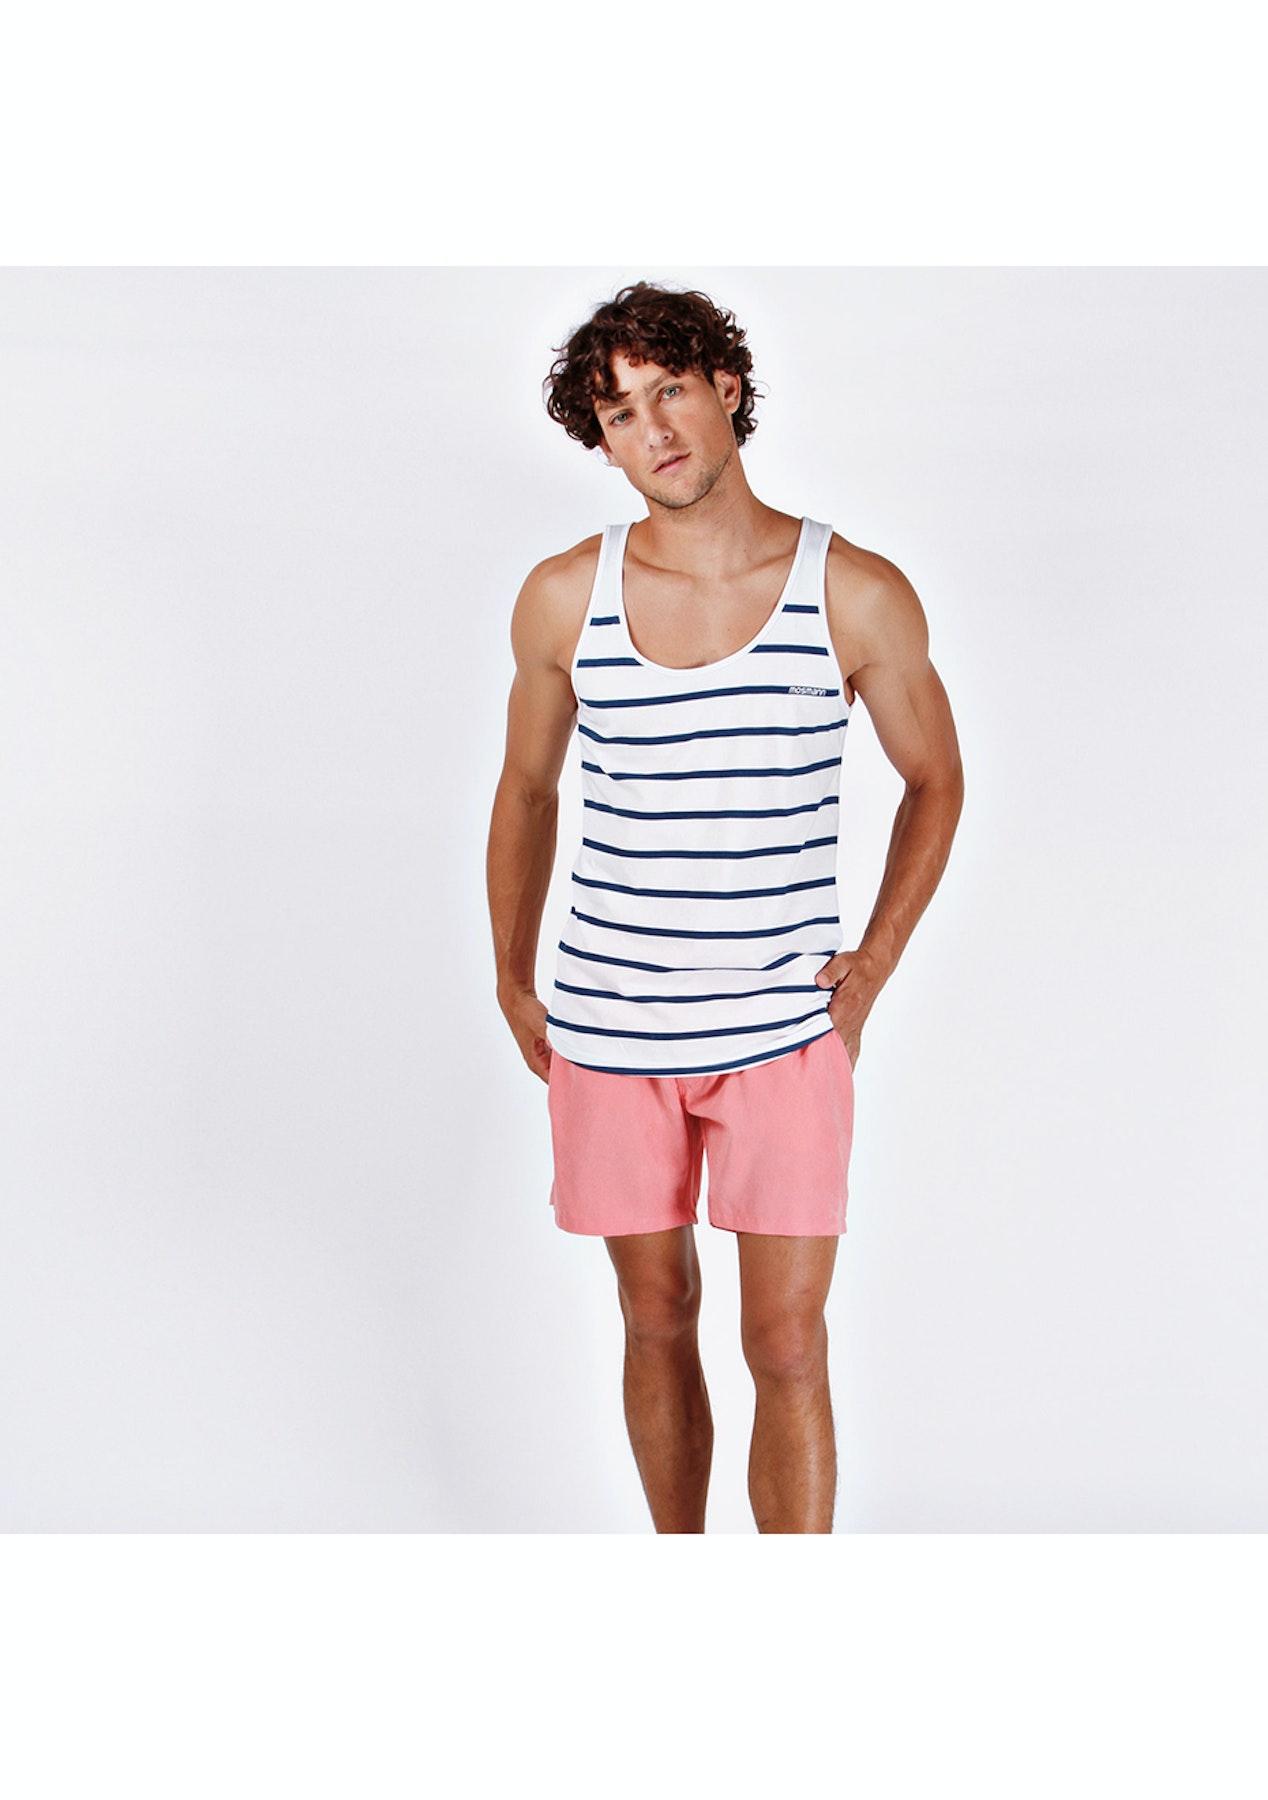 1ba4a97f28 Mosmann Australia - Resort Mid Swim Shorts - Pale Coral - Under $40 Mens  Swim Shorts - Onceit